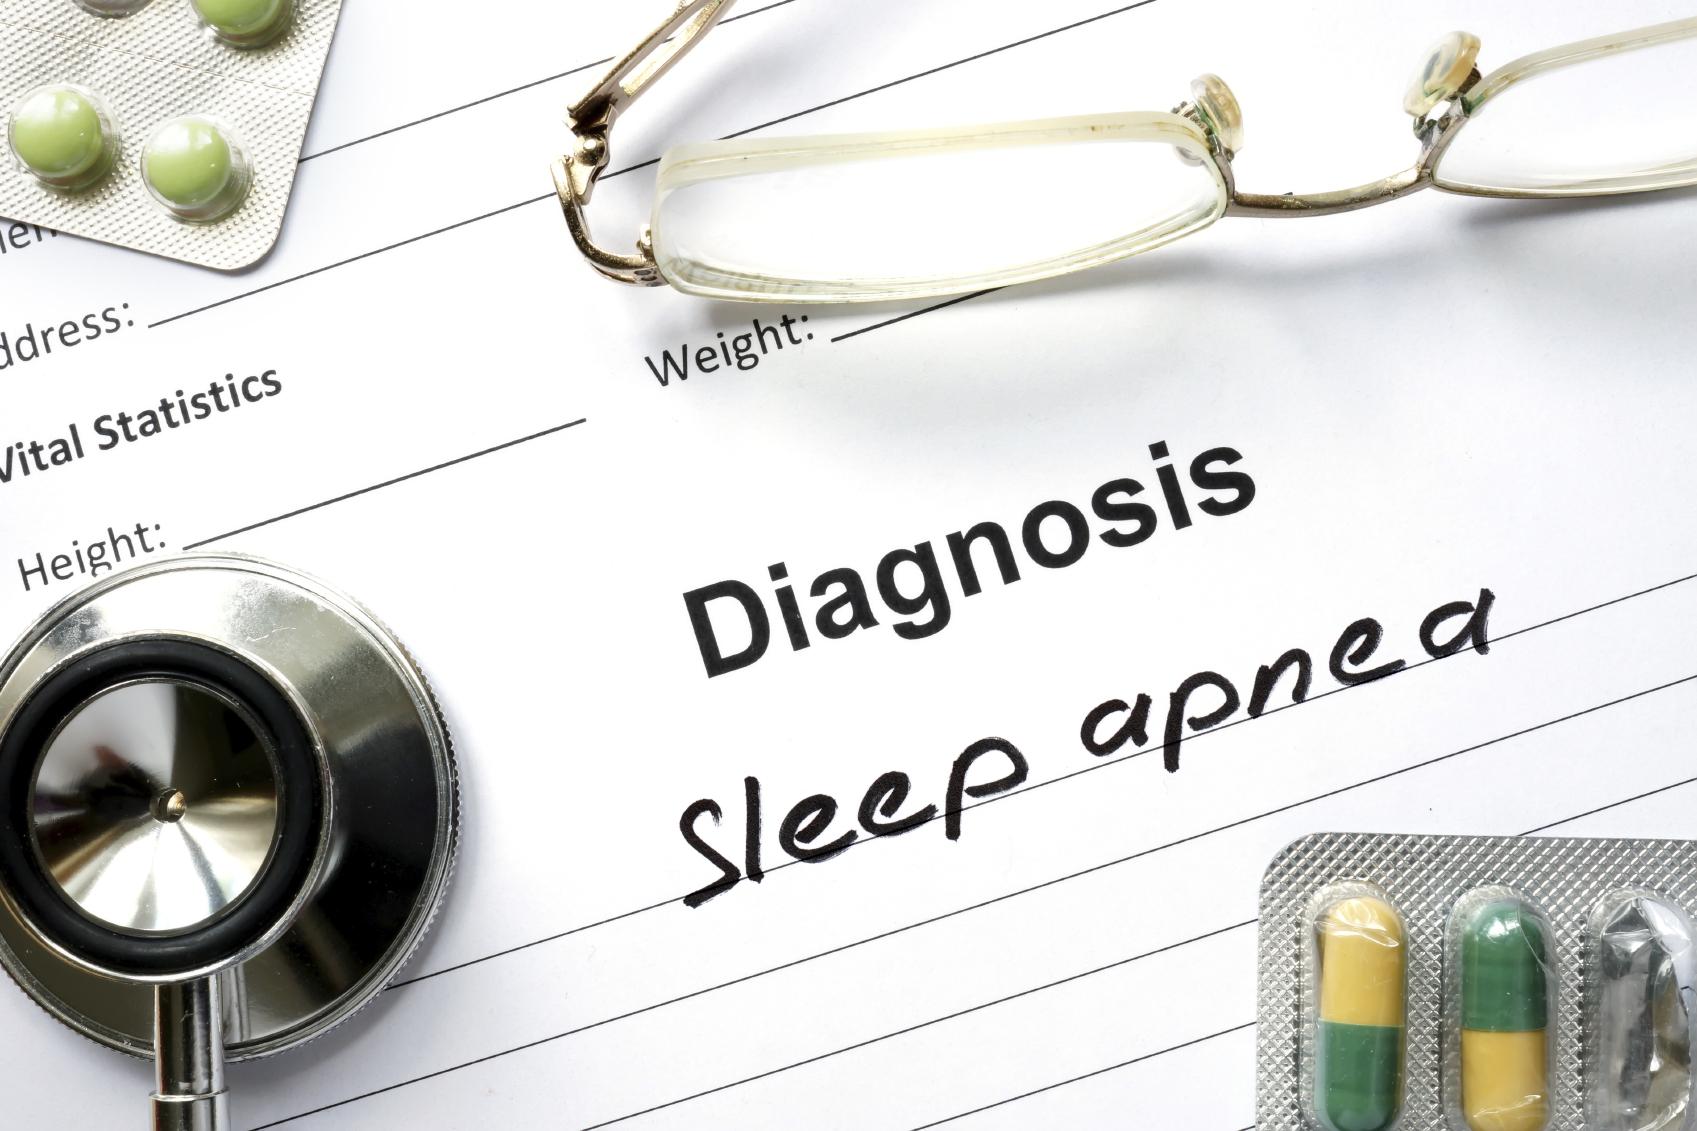 bruxism and sleep apnea